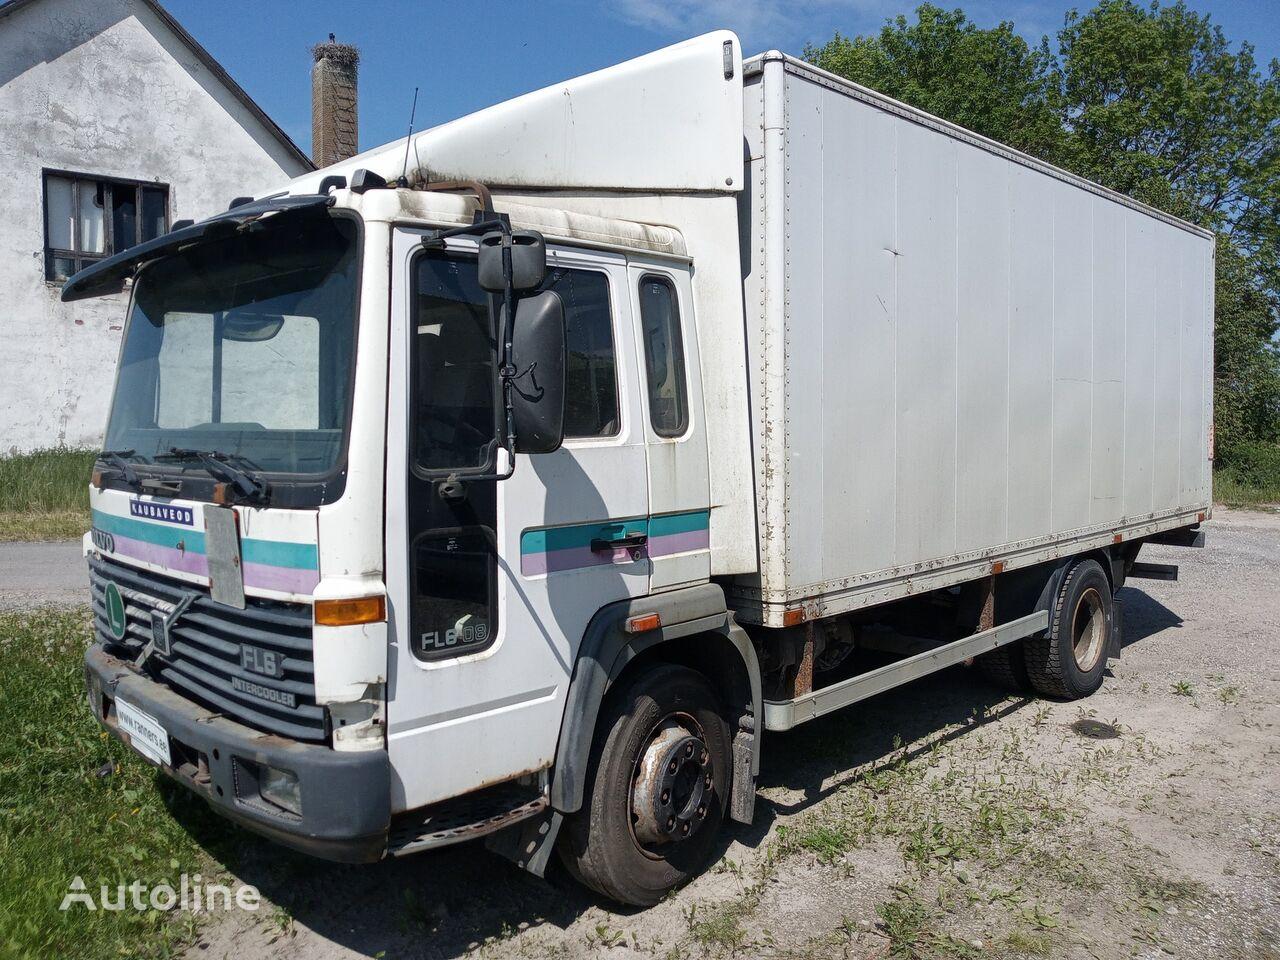 tovornjak zabojnik VOLVO FL6 box+ lift, full steel